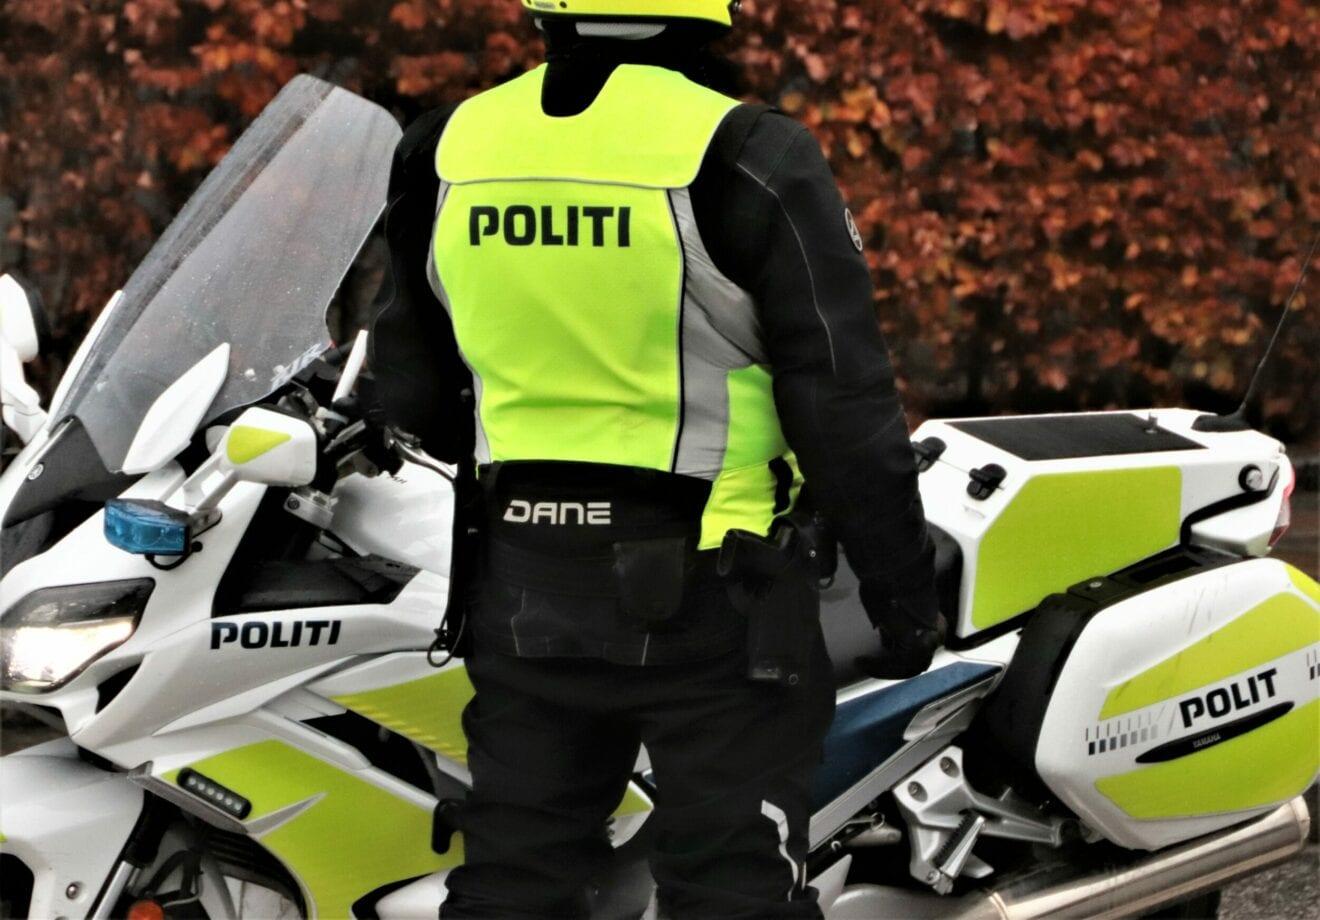 Politirapporten for Gentofte Kommune i tidsrummet 2021-06-04 til 2021-06-15